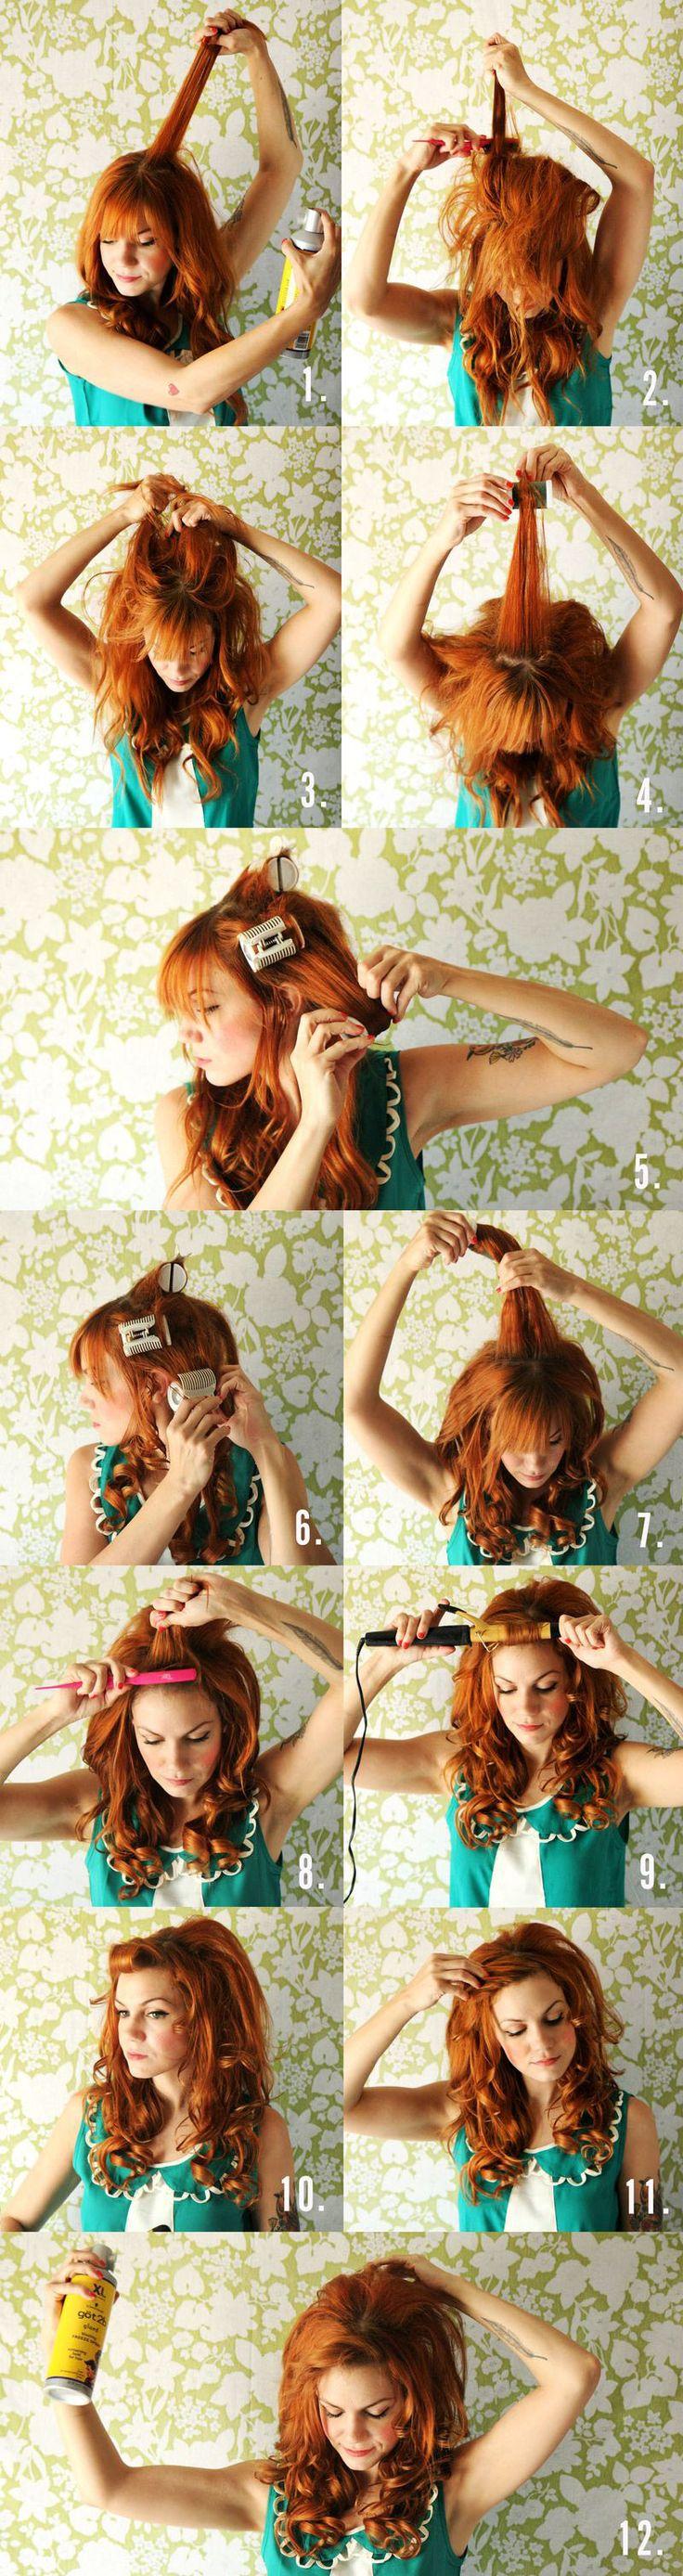 1000 Images About Coiffure On Pinterest Coupes Courtes Bridal